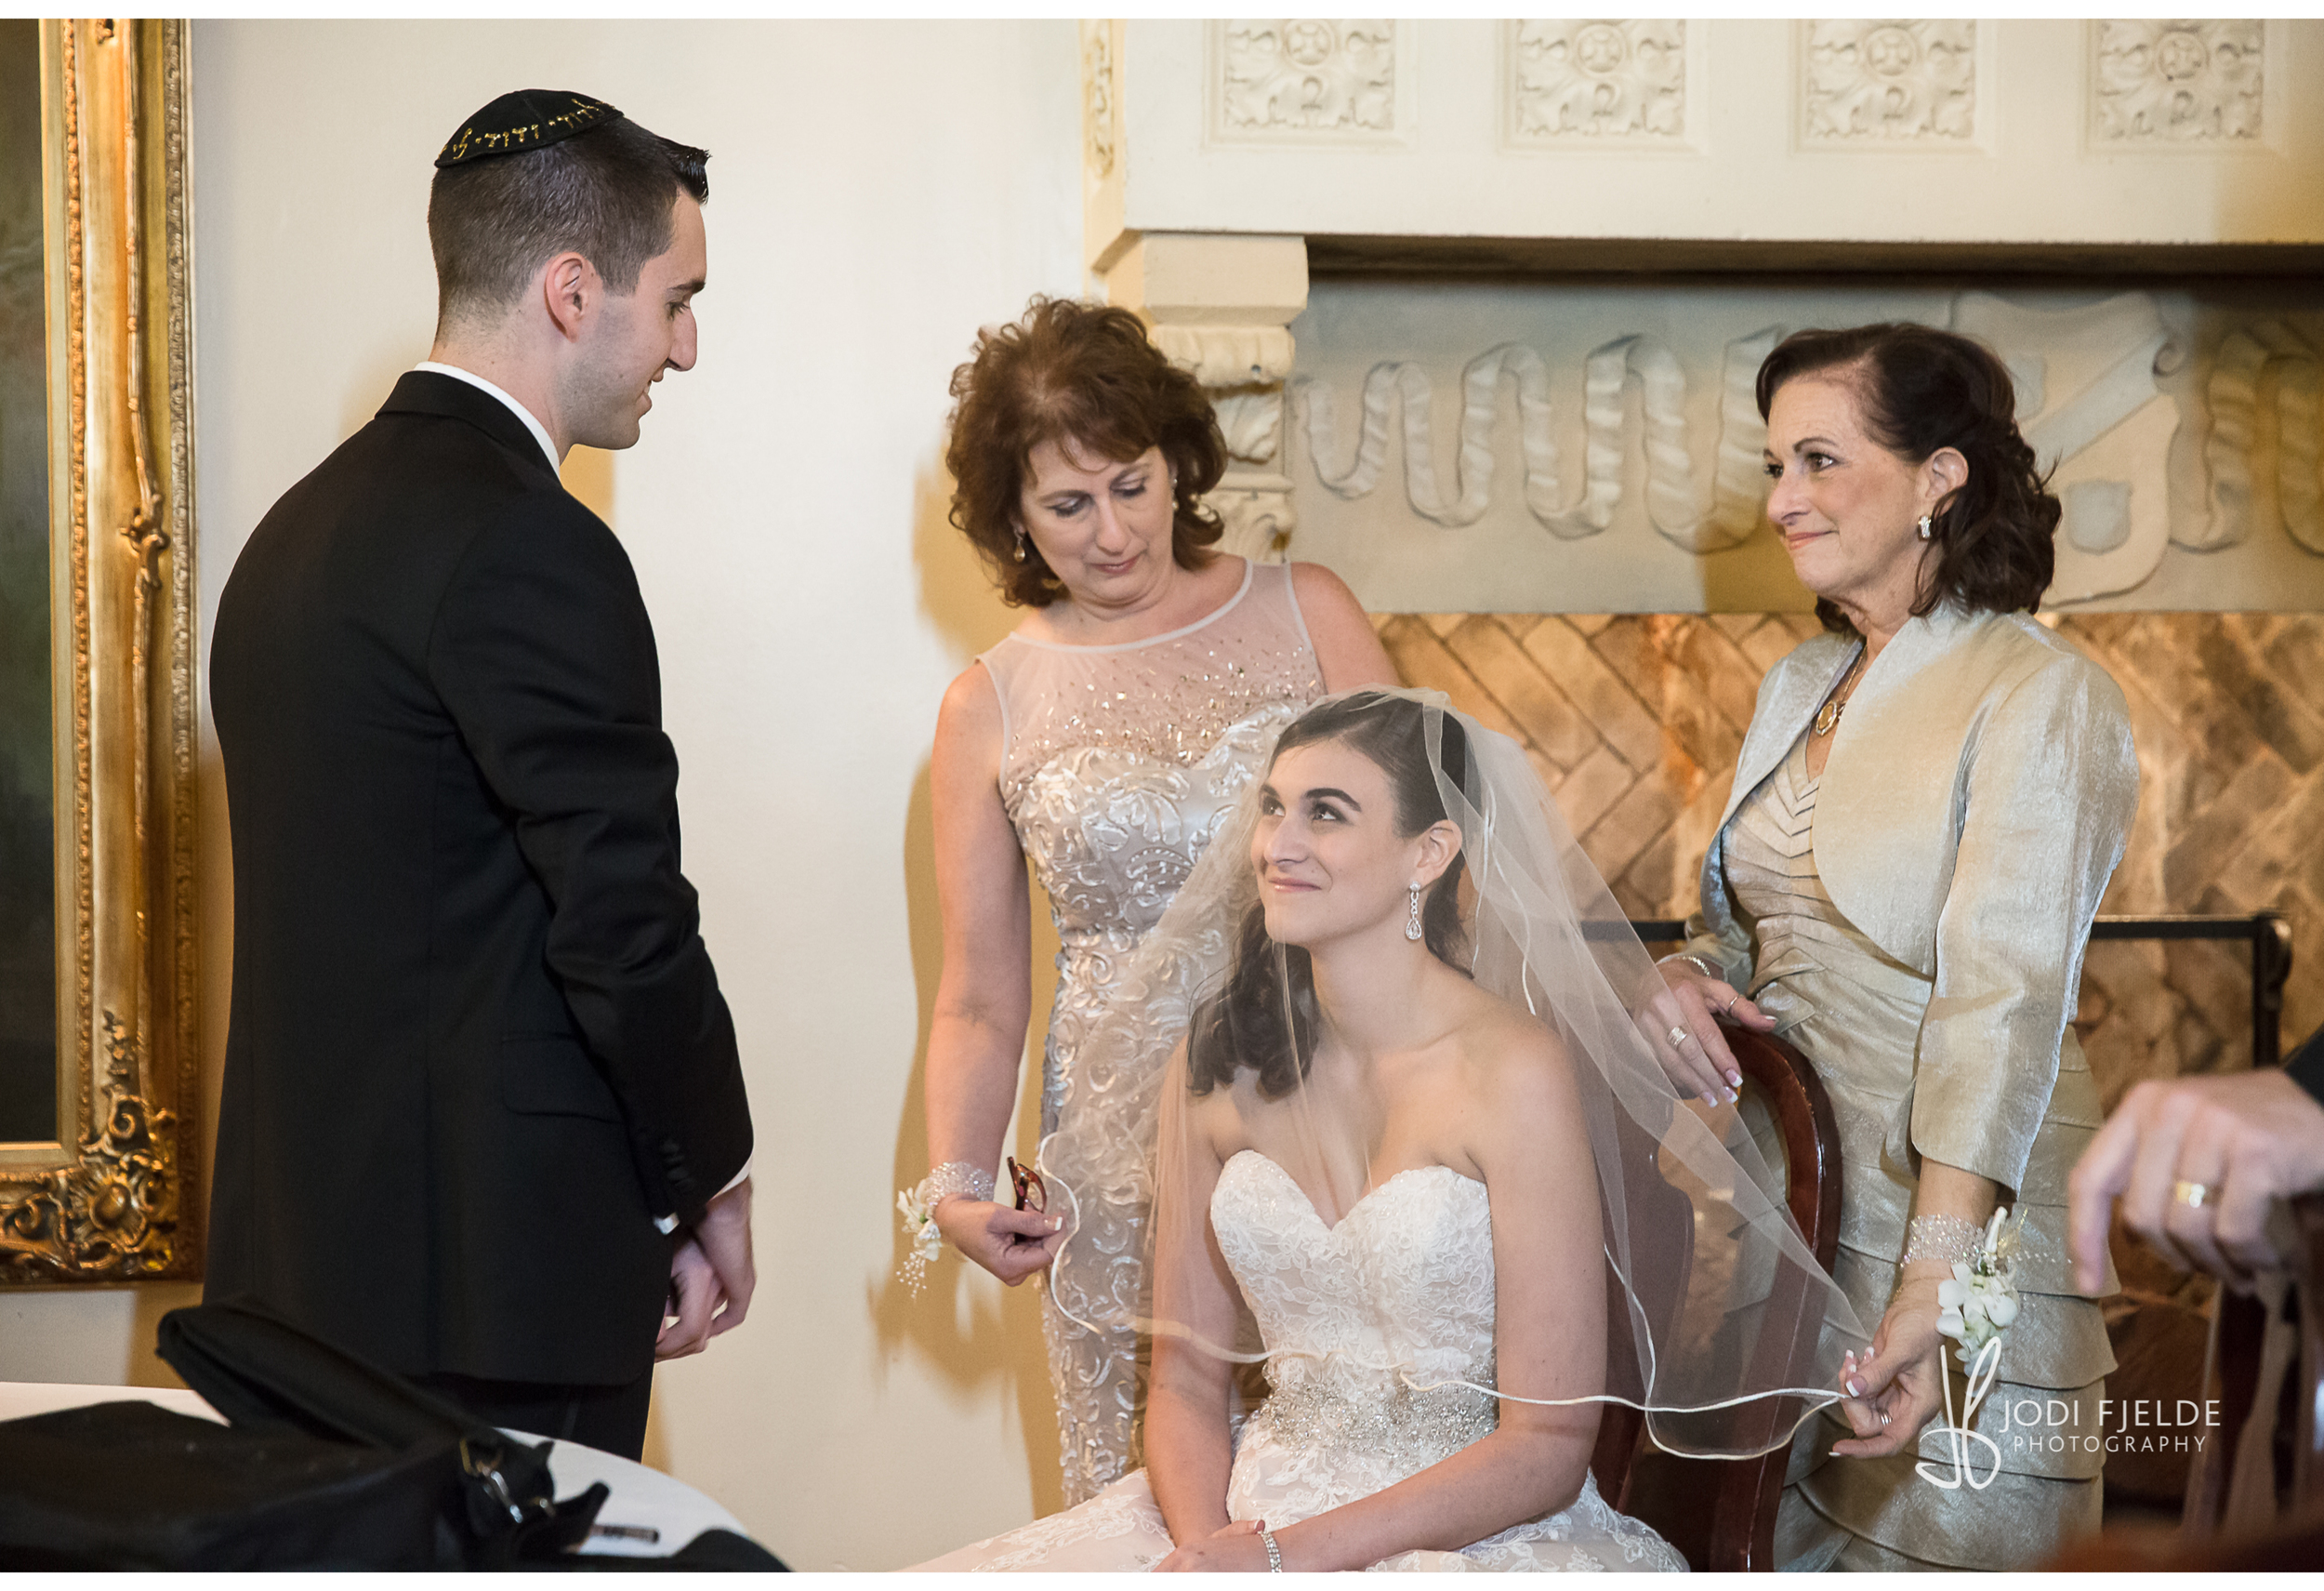 Benvenuto_Palm_Beach_Wedding_Jewish_Michelle & Jason_Jodi_Fjedle_Photography 37.jpg